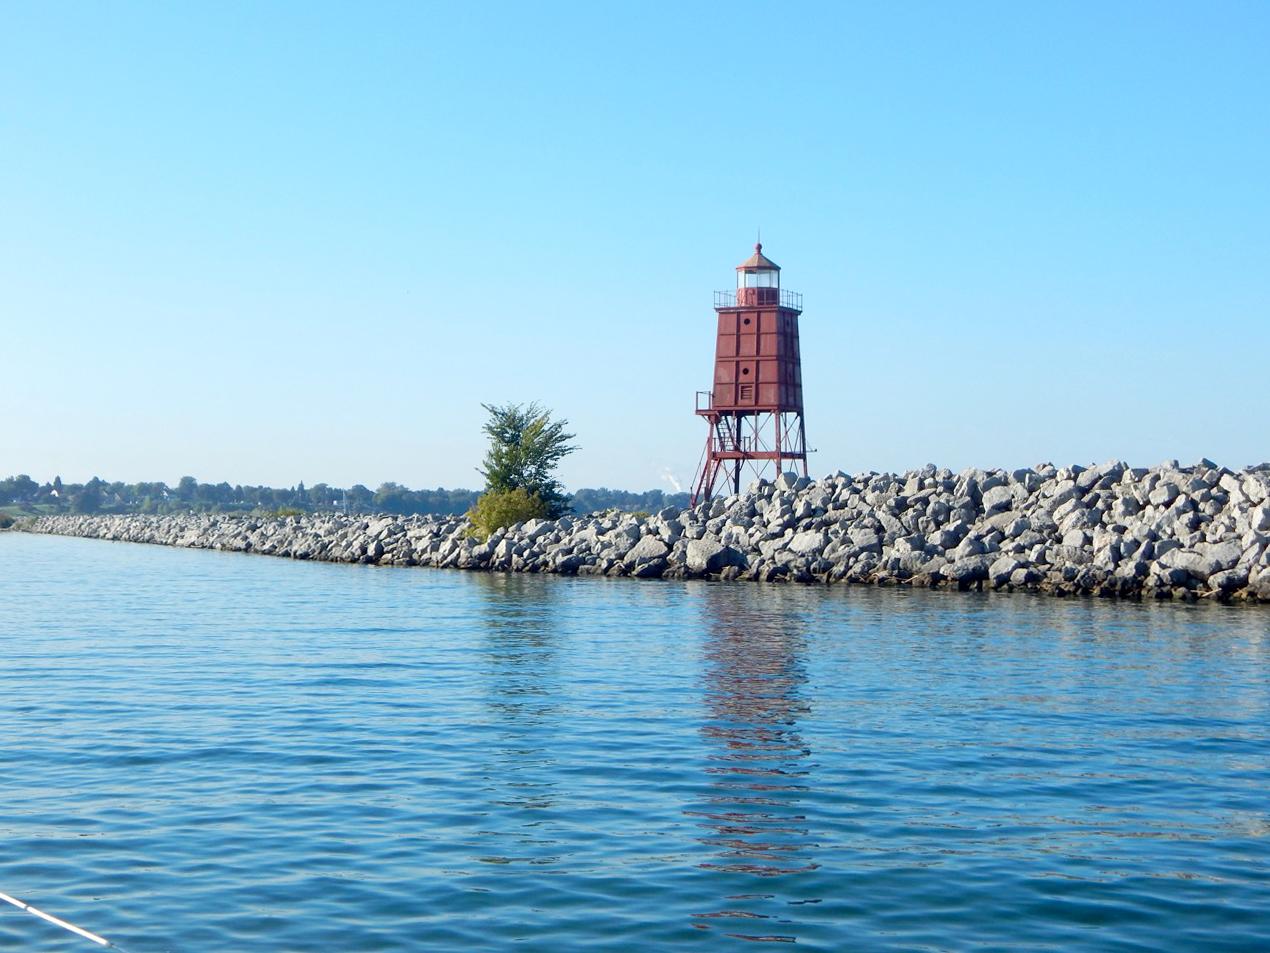 Lighthouse at Racine Harbor entrance